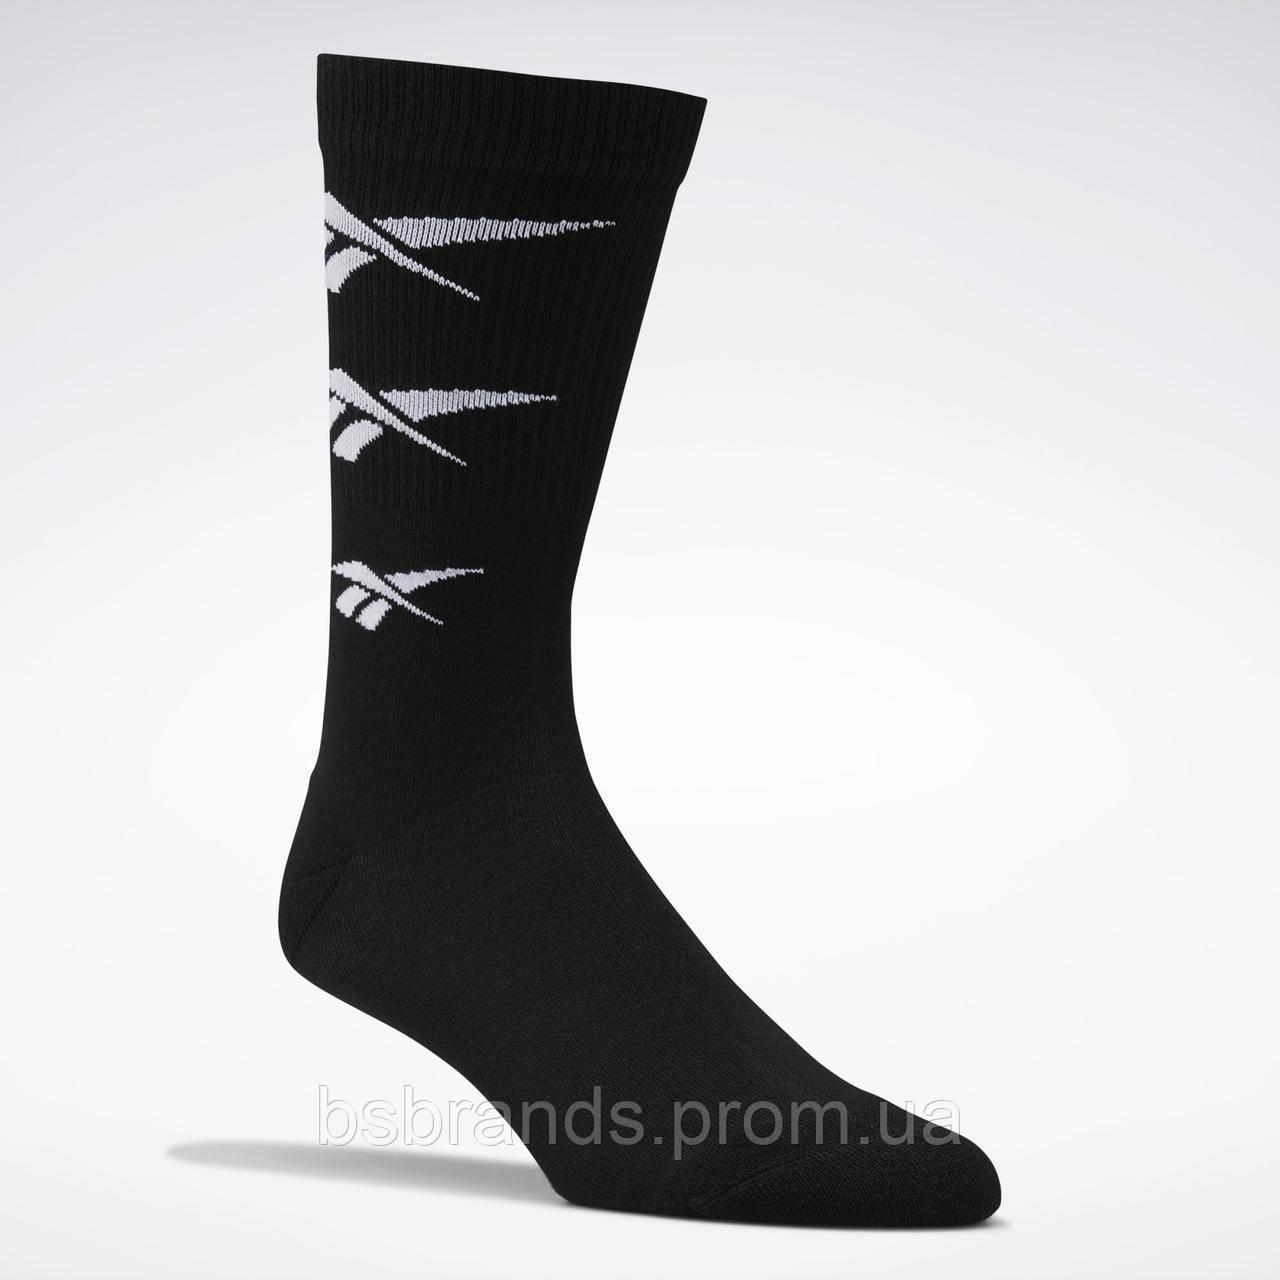 Спортивные носки Reebok Classics Repeat Vector FP7947 (2020/1)